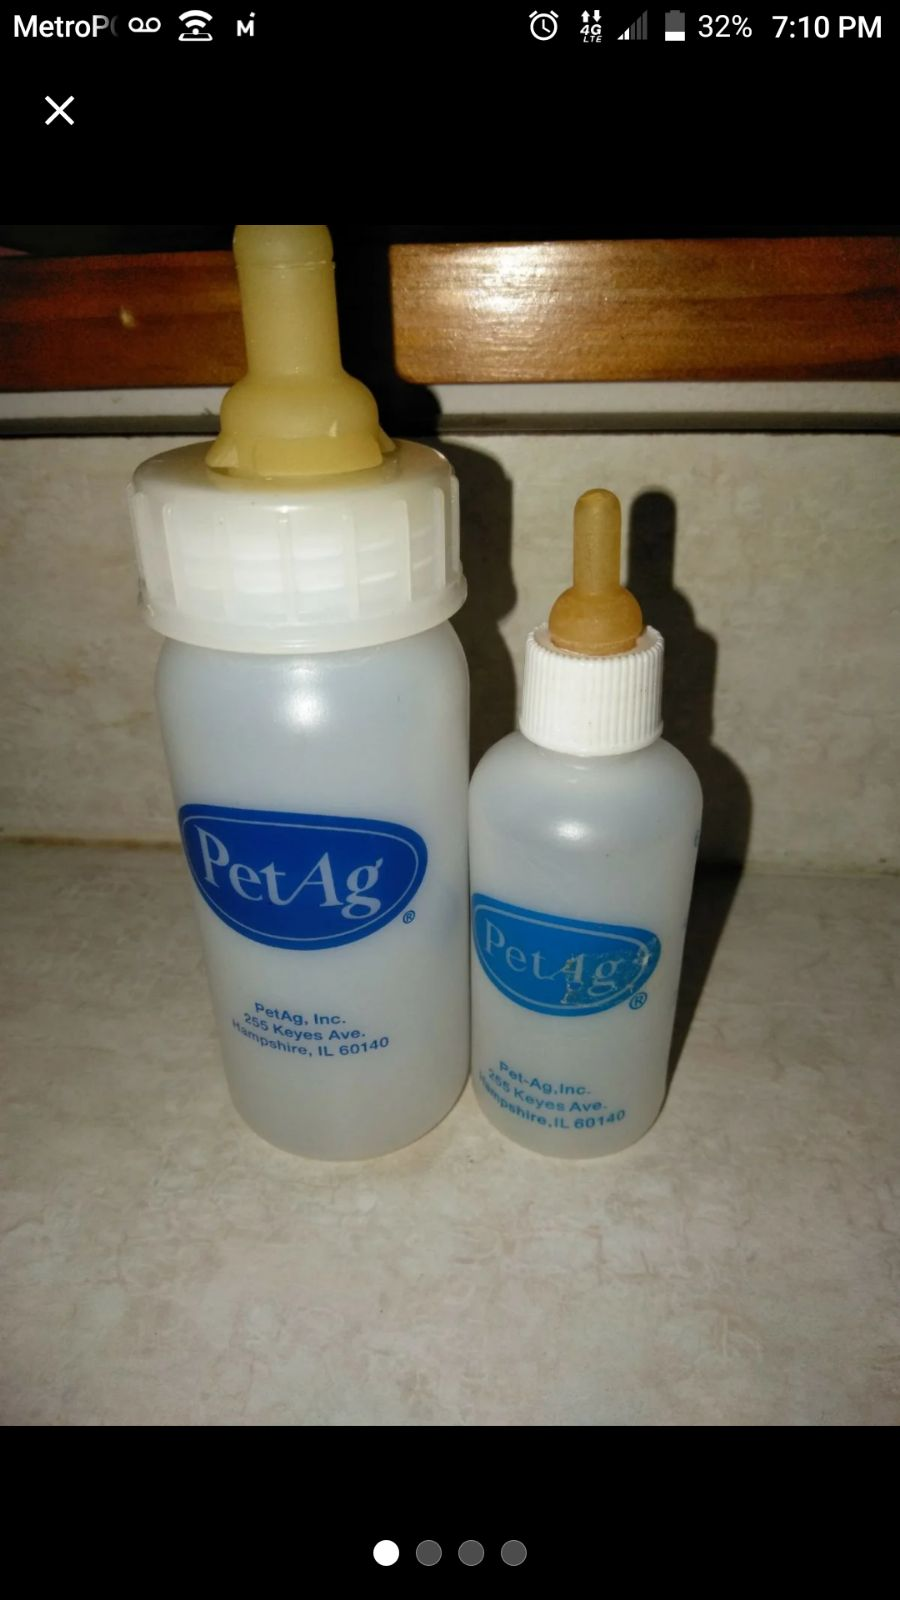 PetAg Animal Nursing Bottle *Sterilized*